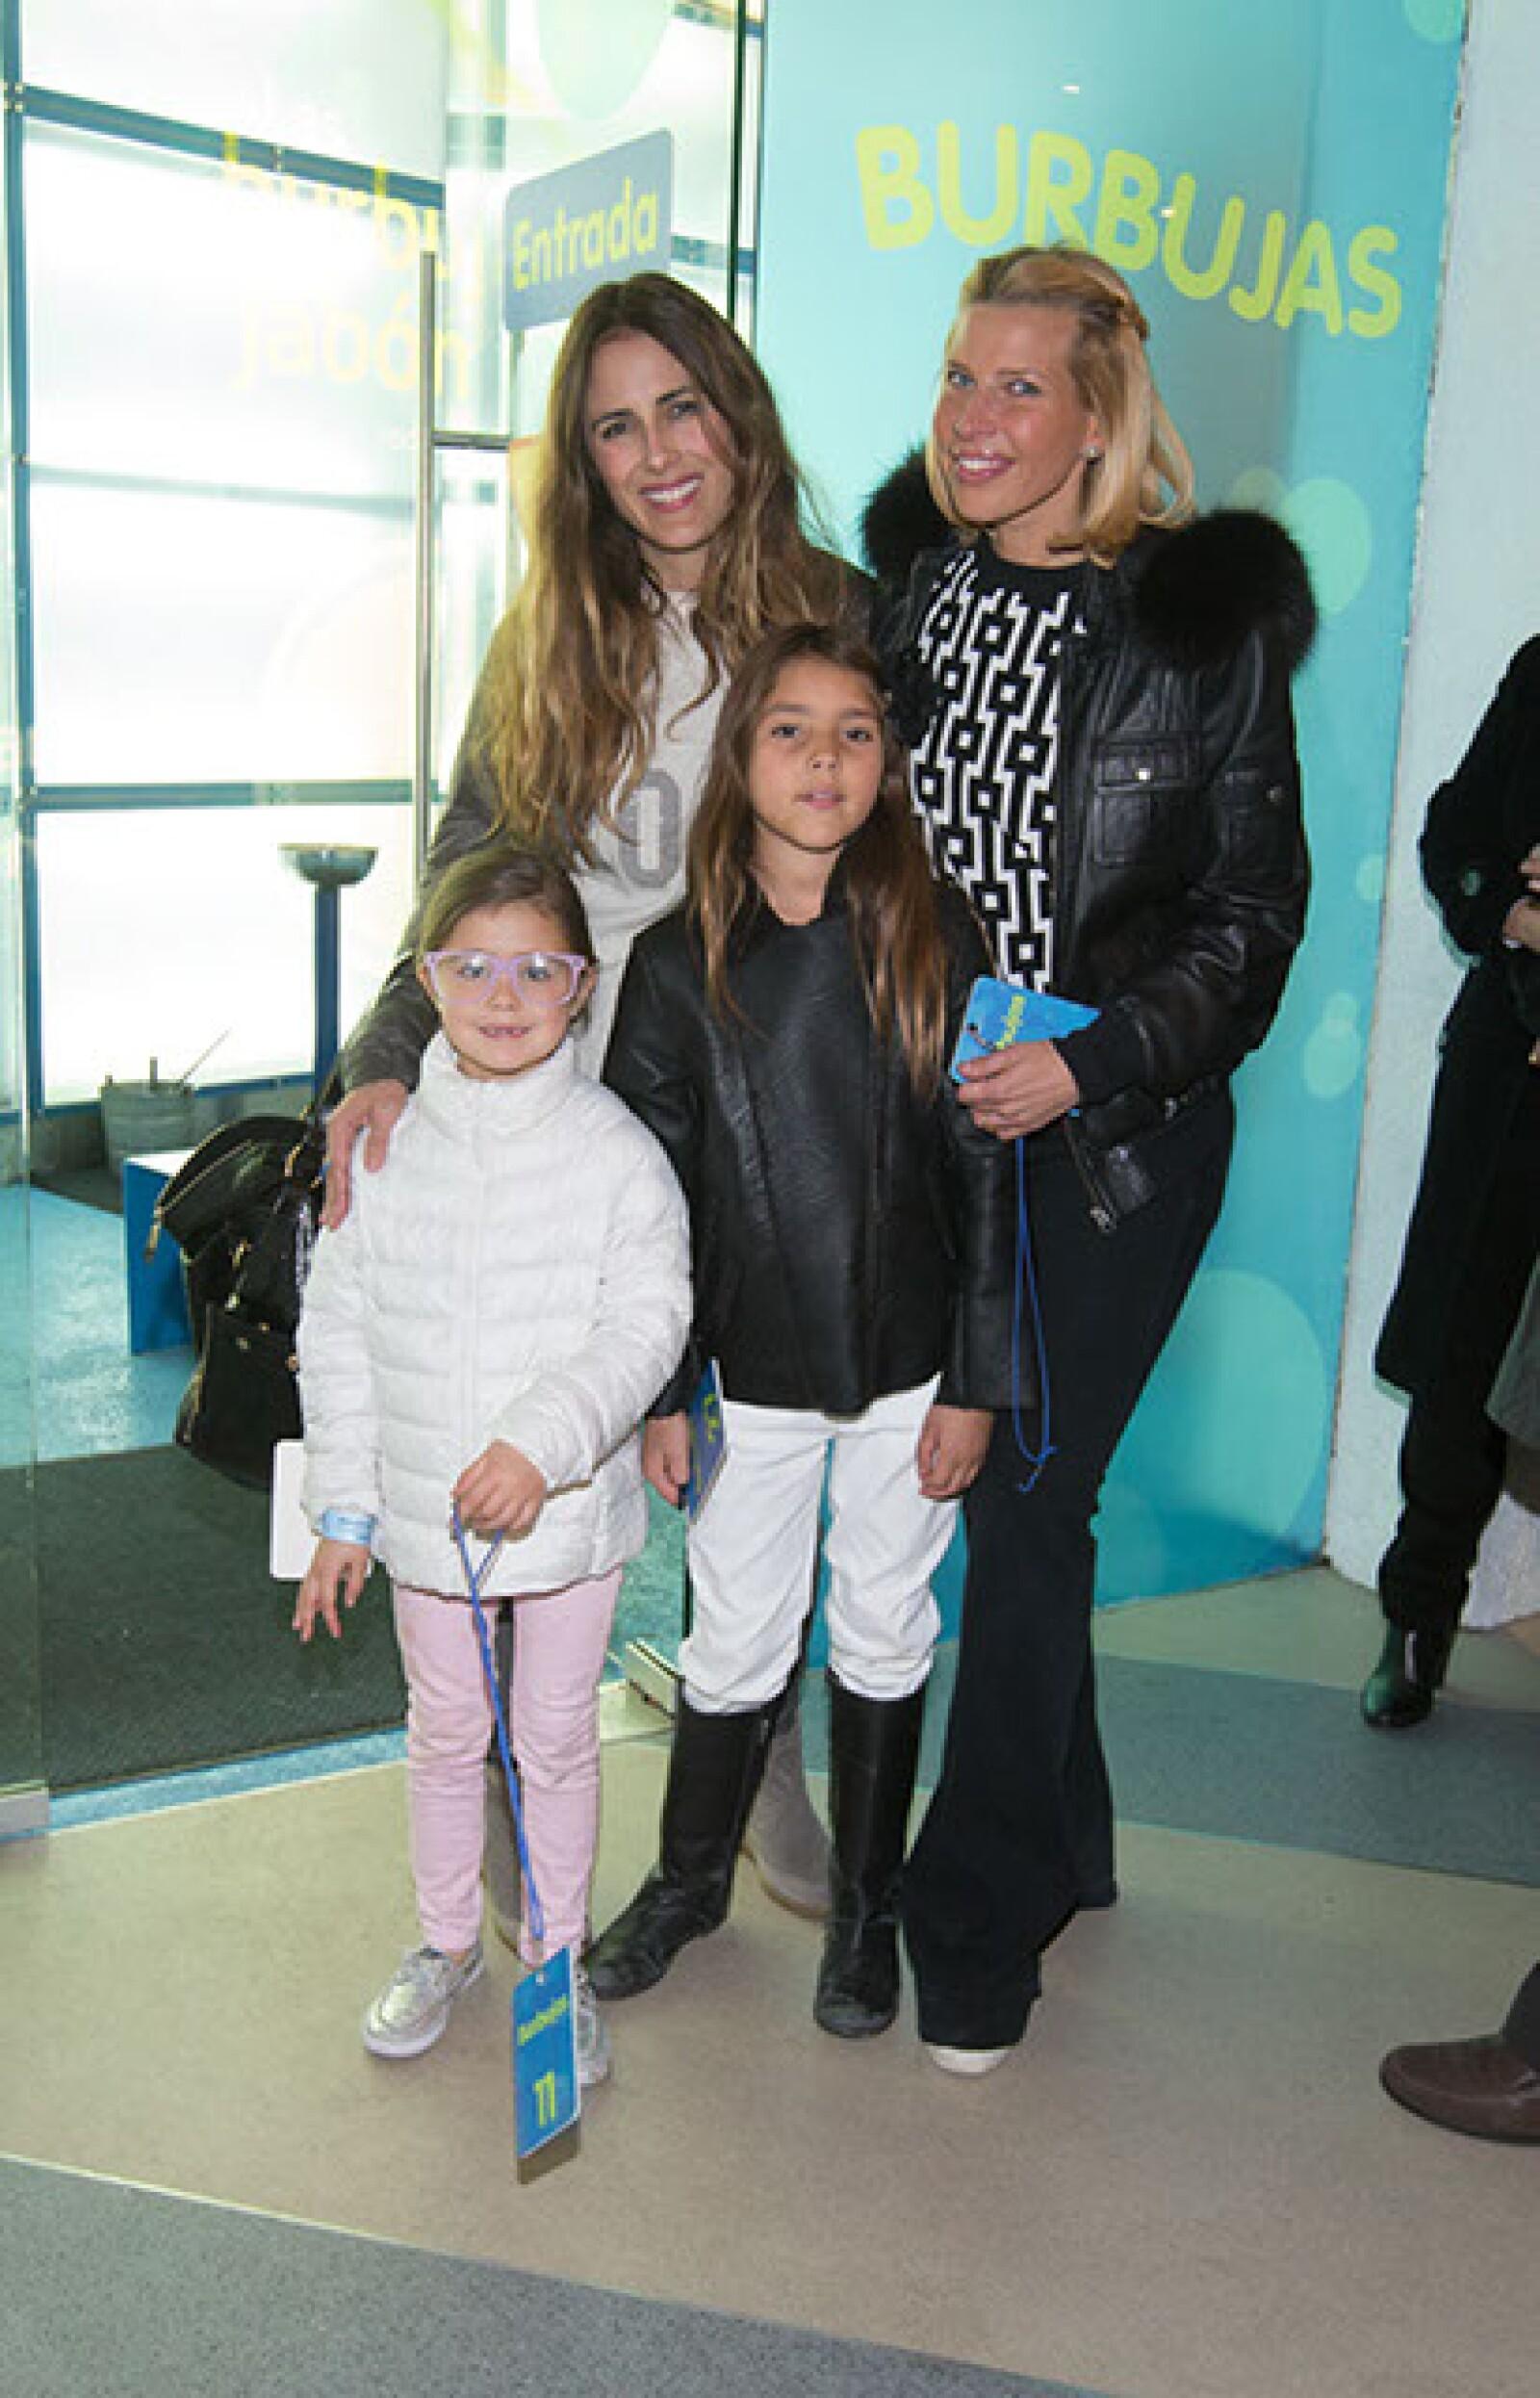 Erika Basavé,Juliana Basavé,Beatriz Moctezuma,Beatriz Pasquel